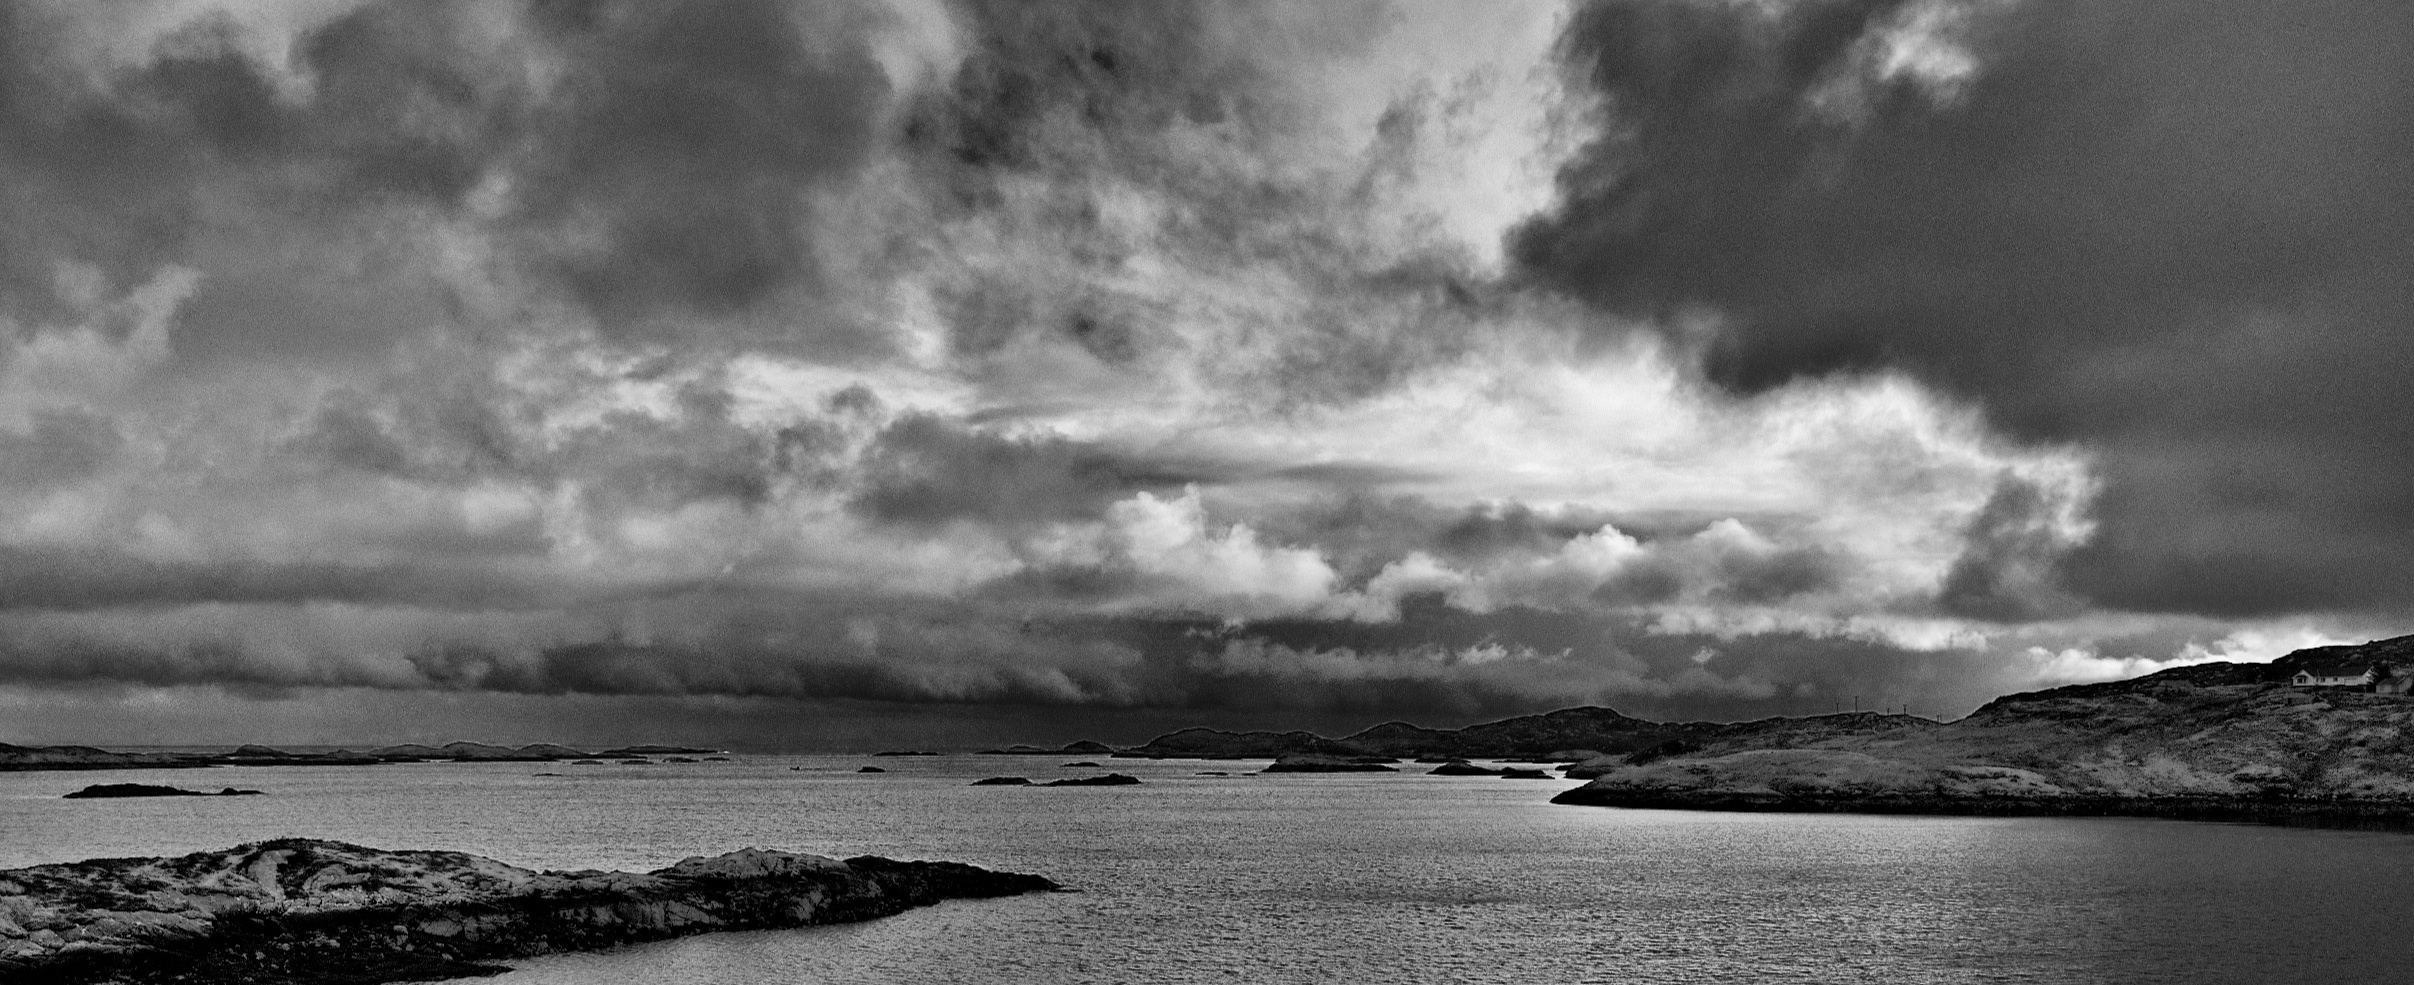 Loch Ghreosabhagh, D7000/16-85mm